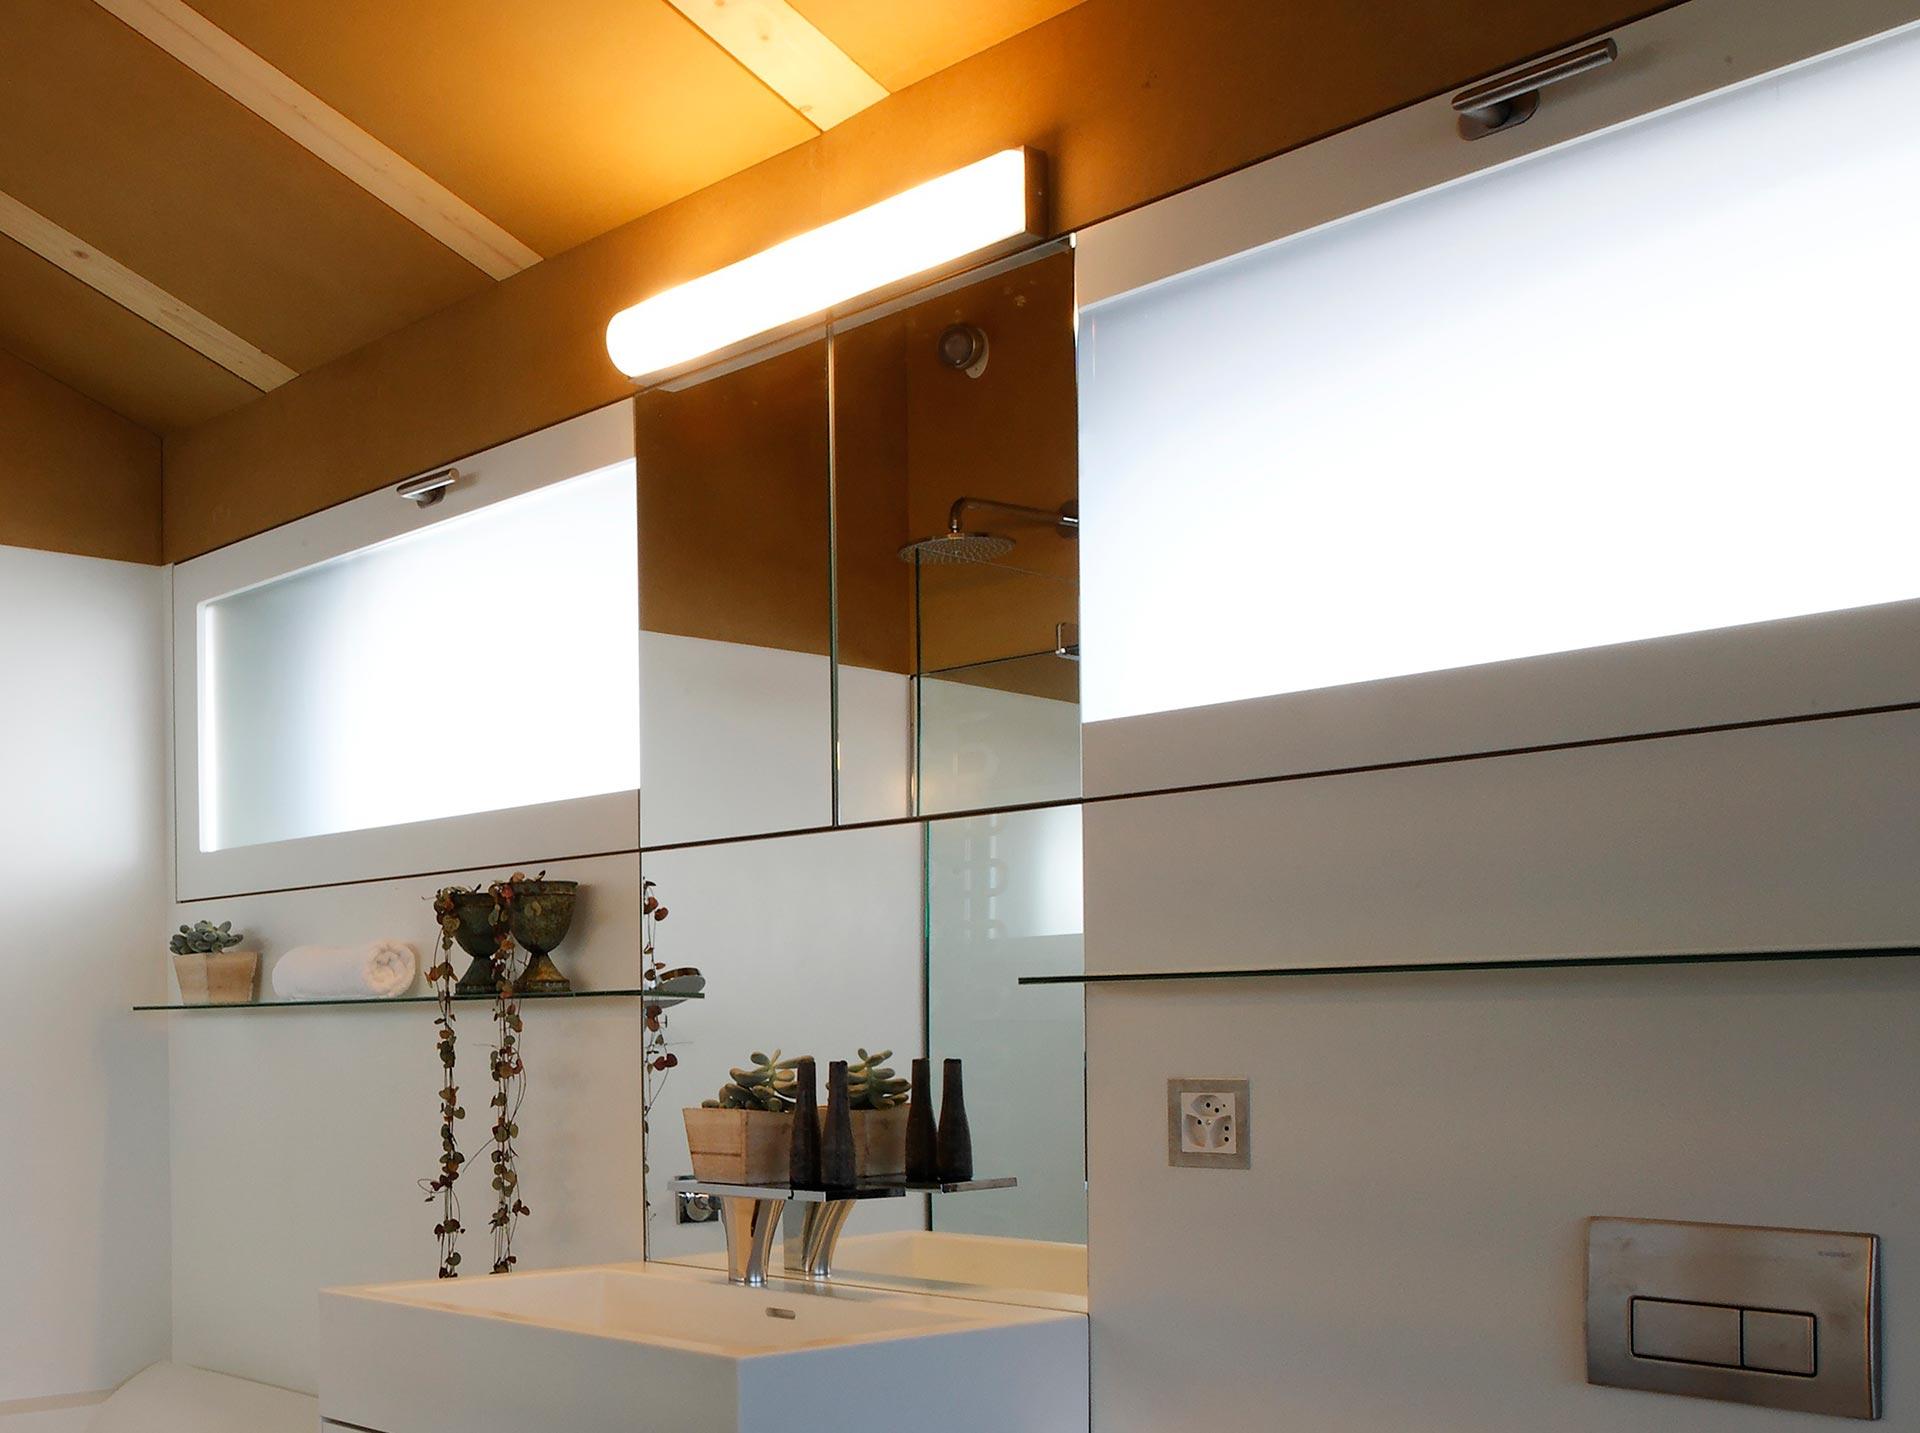 staron miroir - Rénovation d'un Raccard